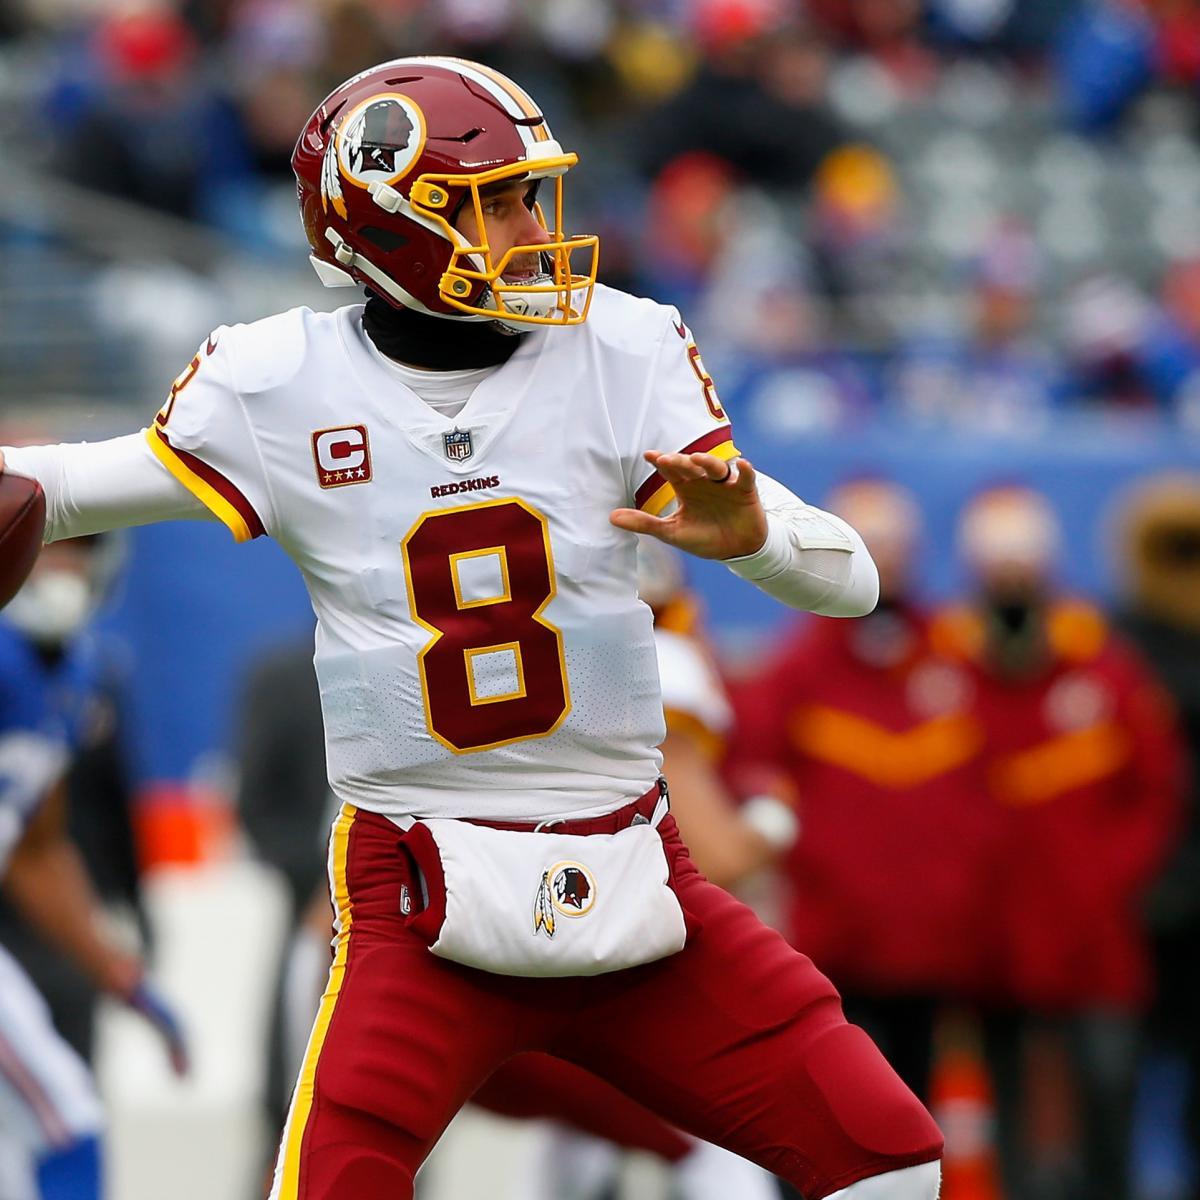 NFL Draft 2018: 1st-Round Mock Draft Based On Day 1